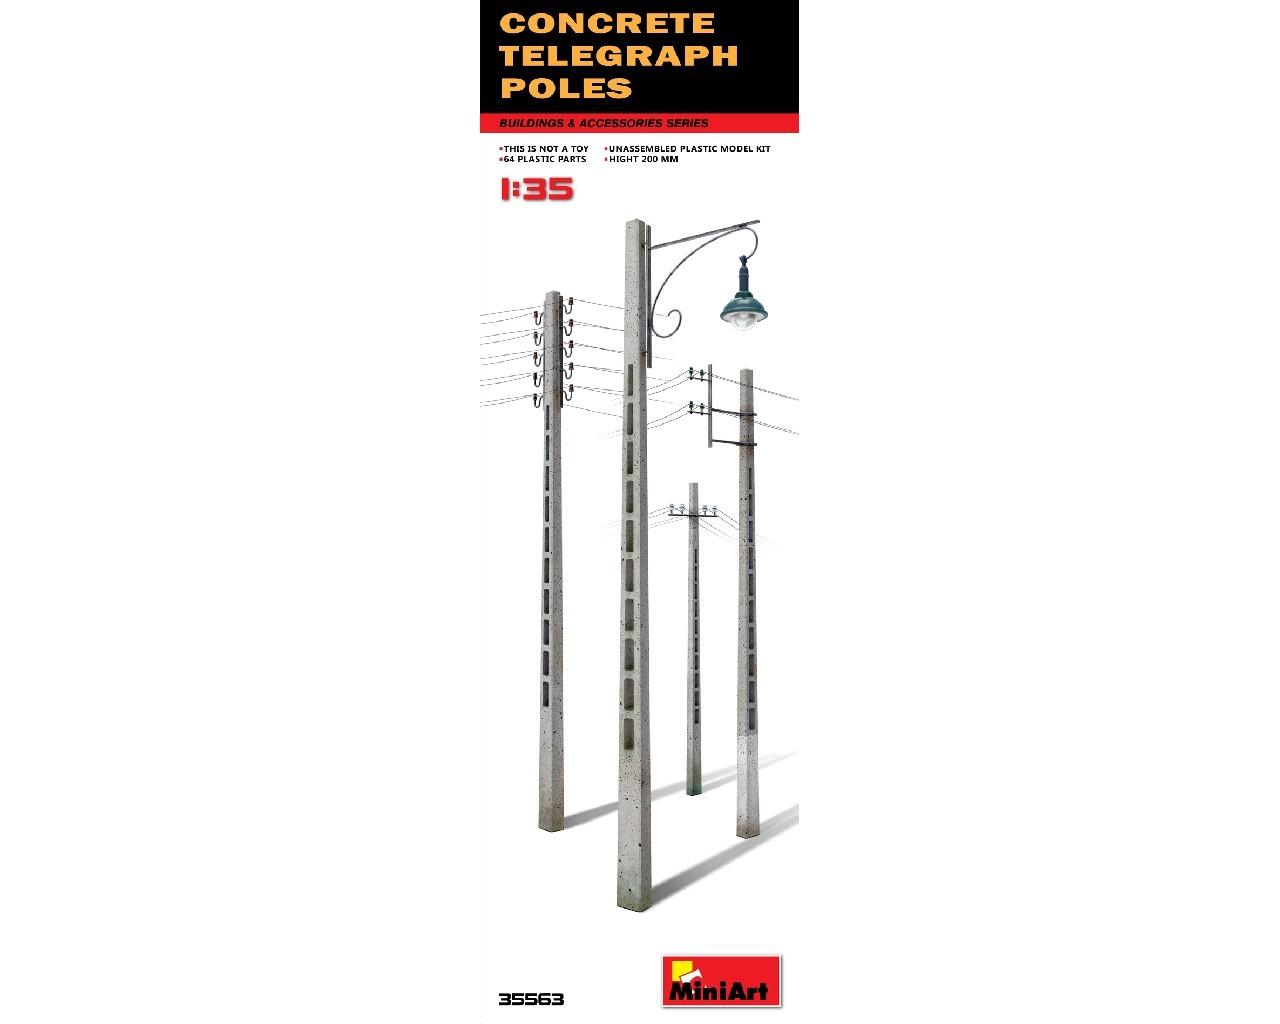 1/35  Concrete Telegraph Poles